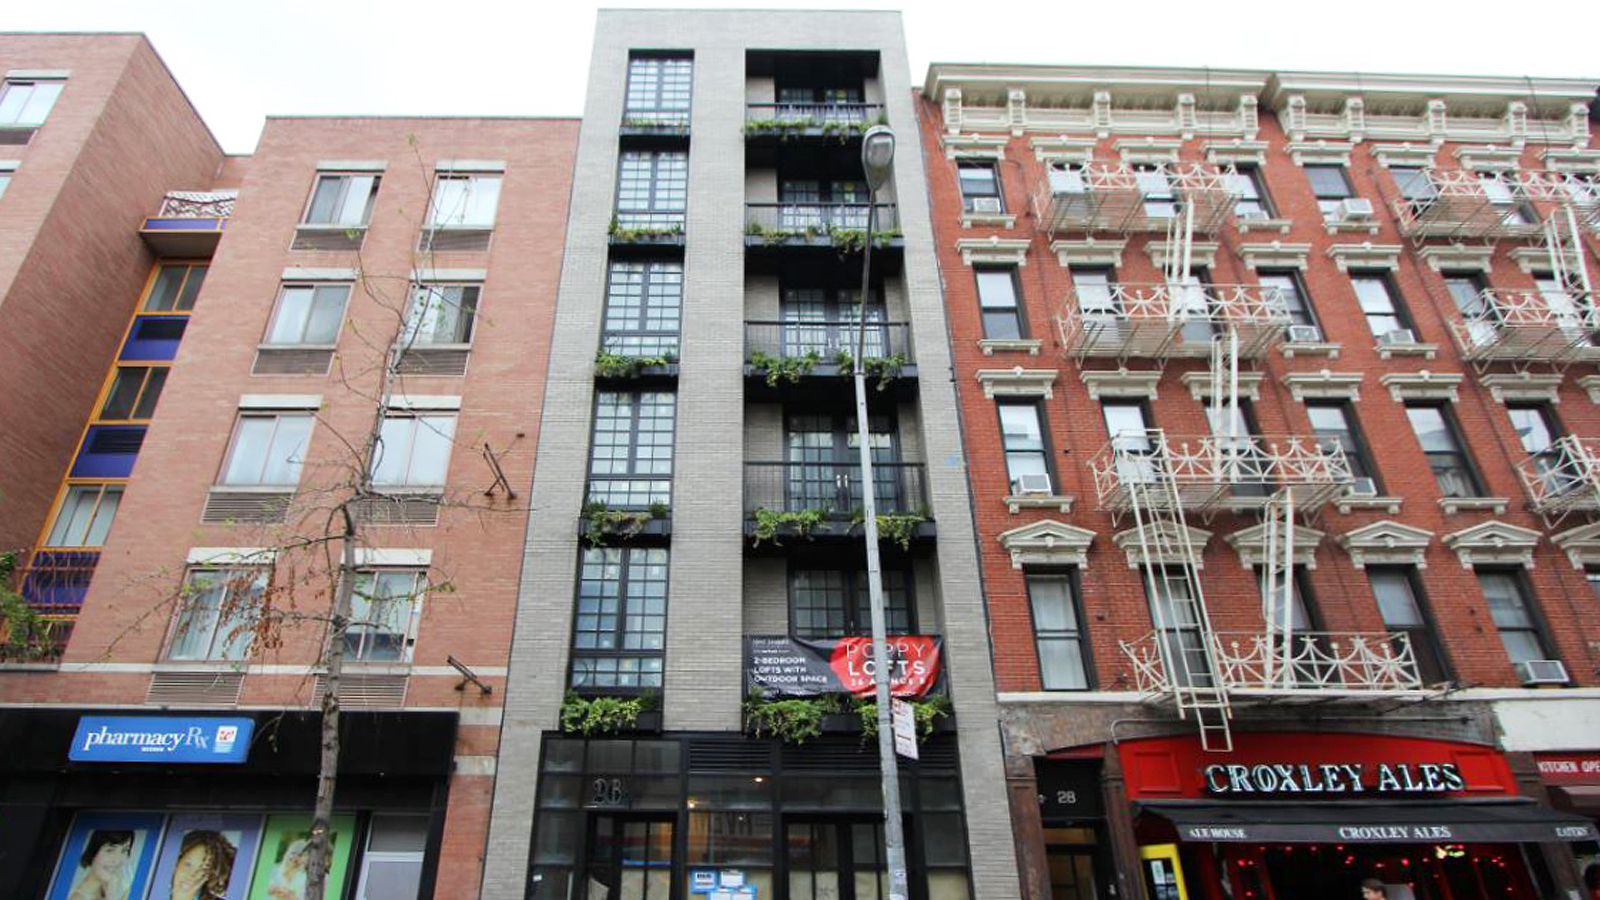 Poppy Lofts, 26 Avenue B